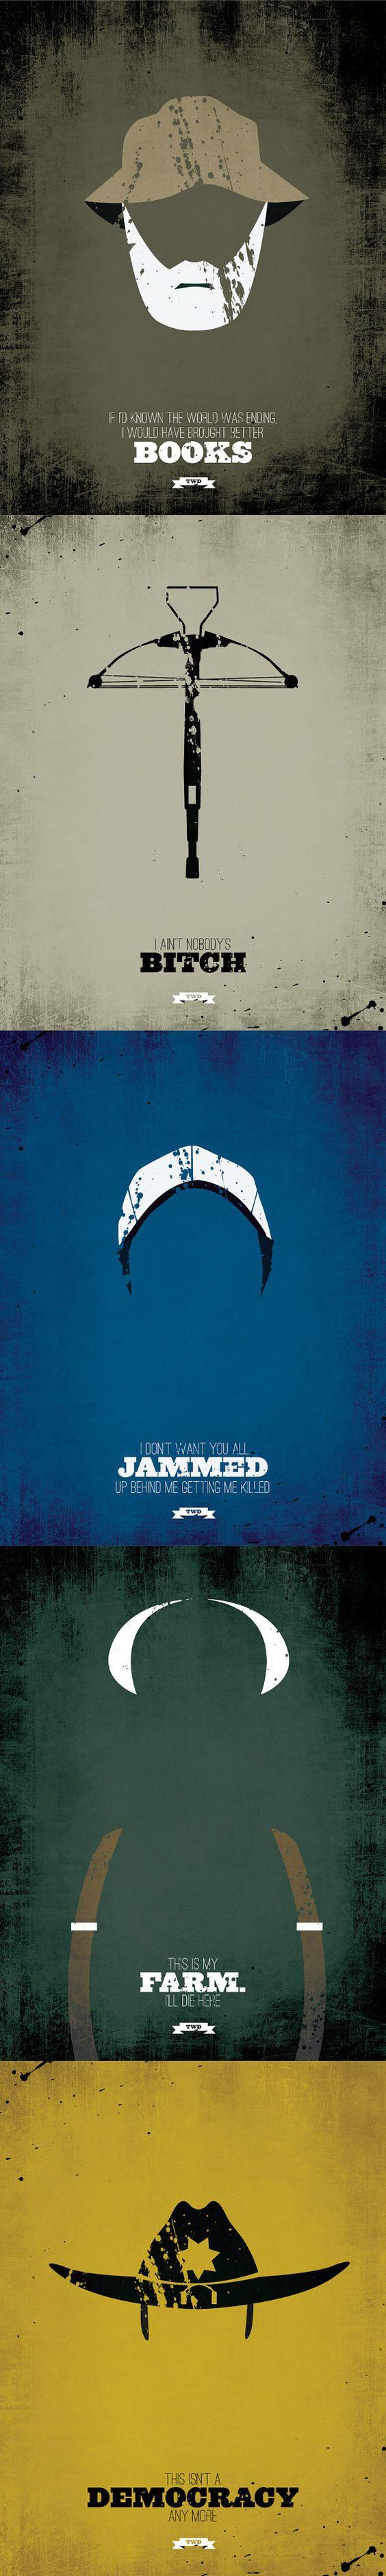 Walking Dead minimalist poster designs.